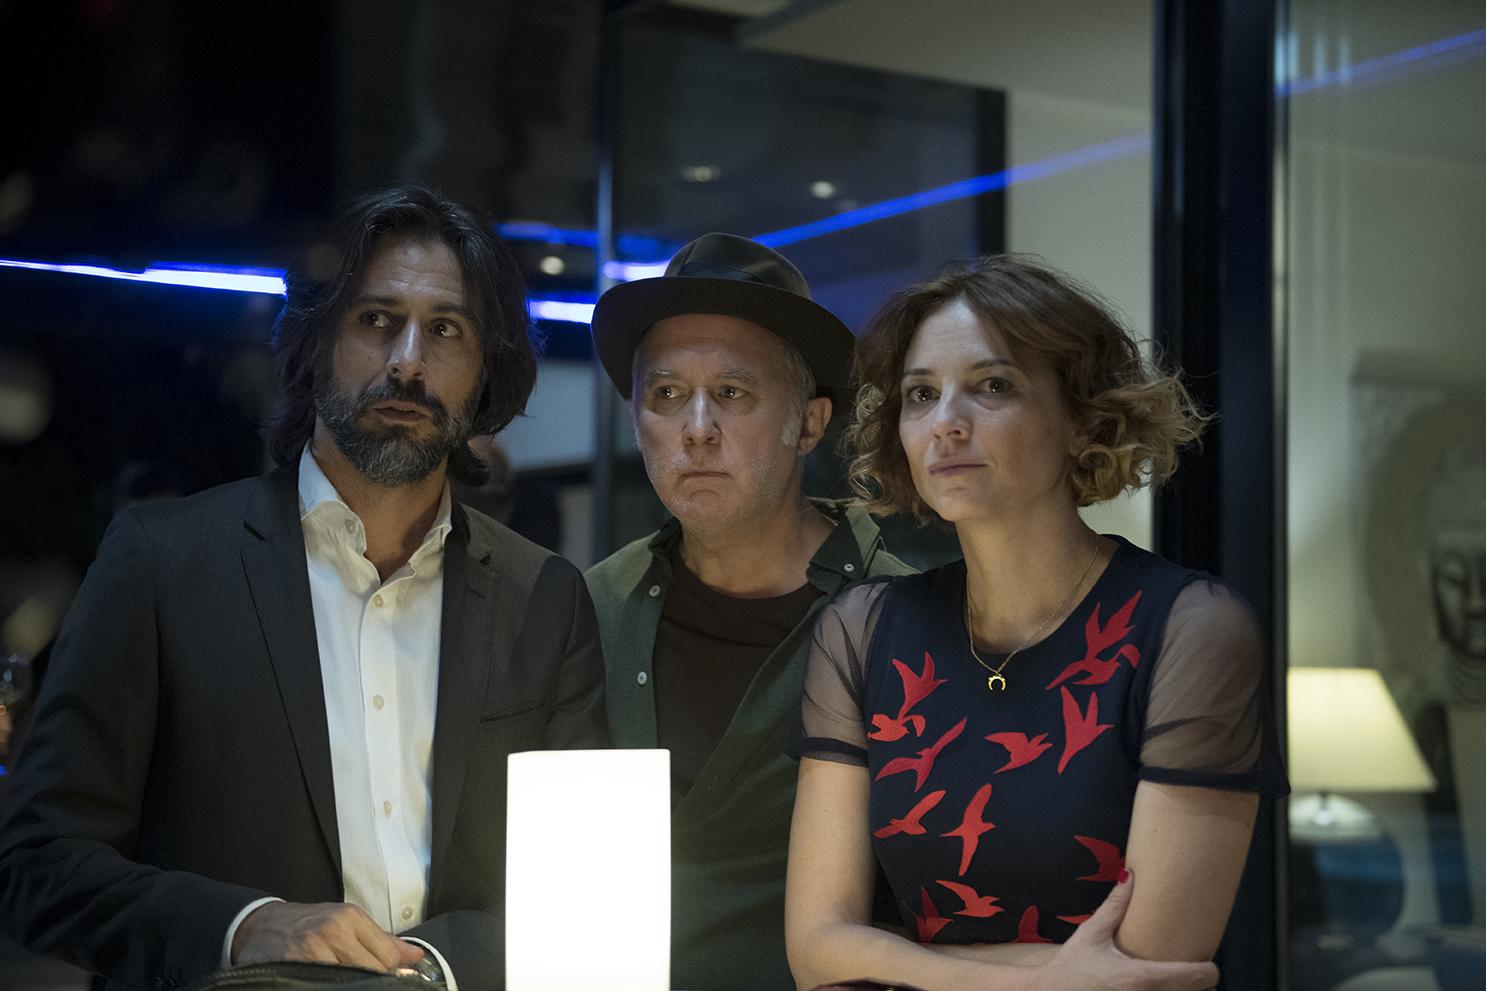 Hugo Silva, Leonor Watling y Luis Bermejo, protagonistas de 'Nasdrovia', serie original Movistar+